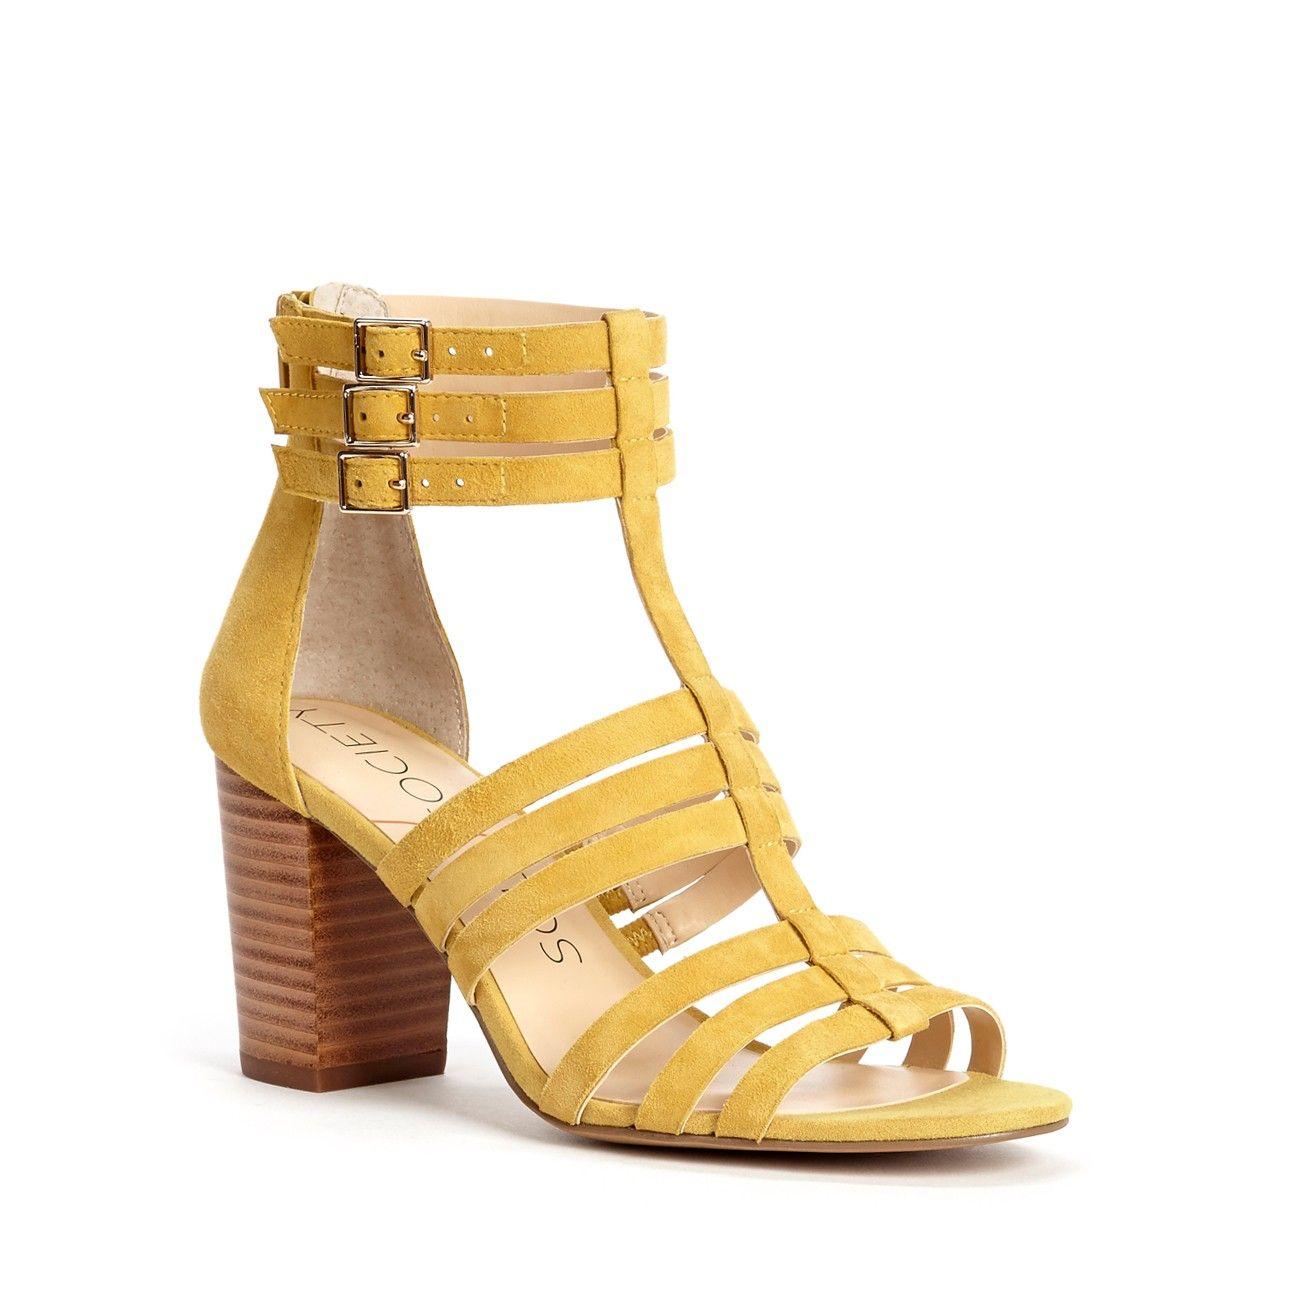 Sole Society Elise Mustard Yellow Suede Gladiator Block Heel Sandals NEW